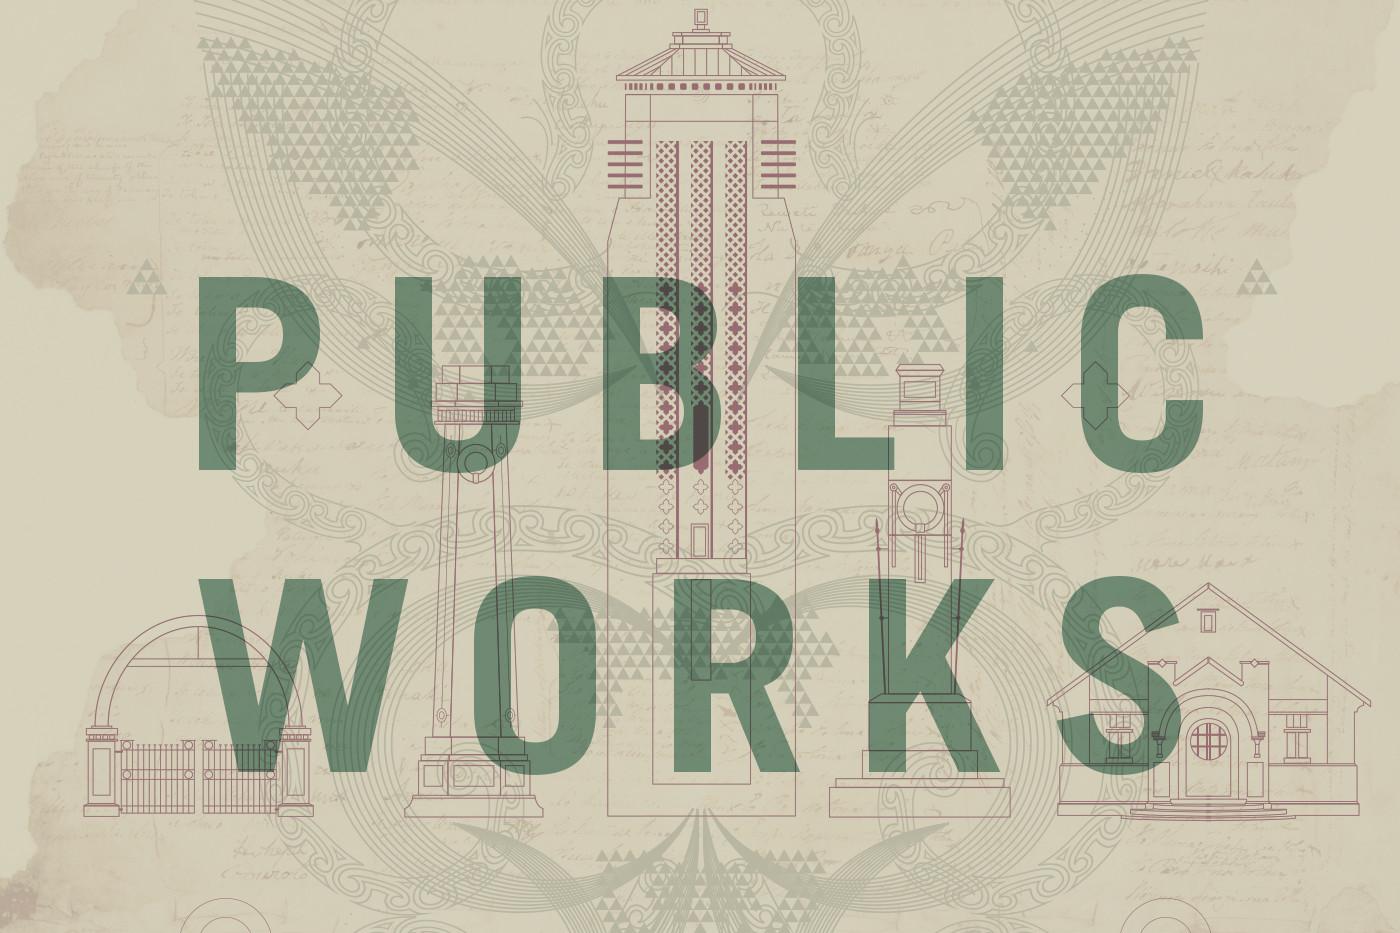 Public Works - poster image by Tim Hansen